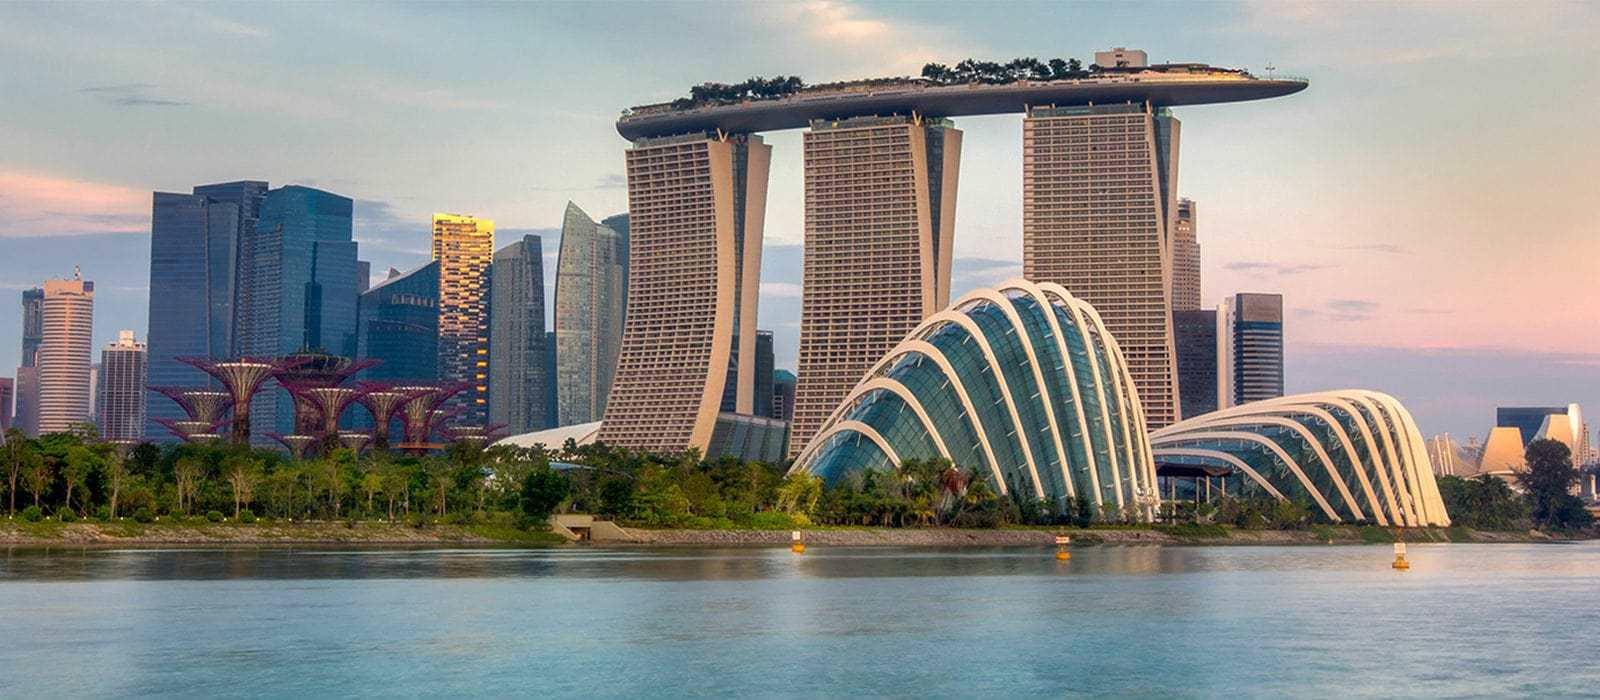 Marina Bay Sands ở đâu